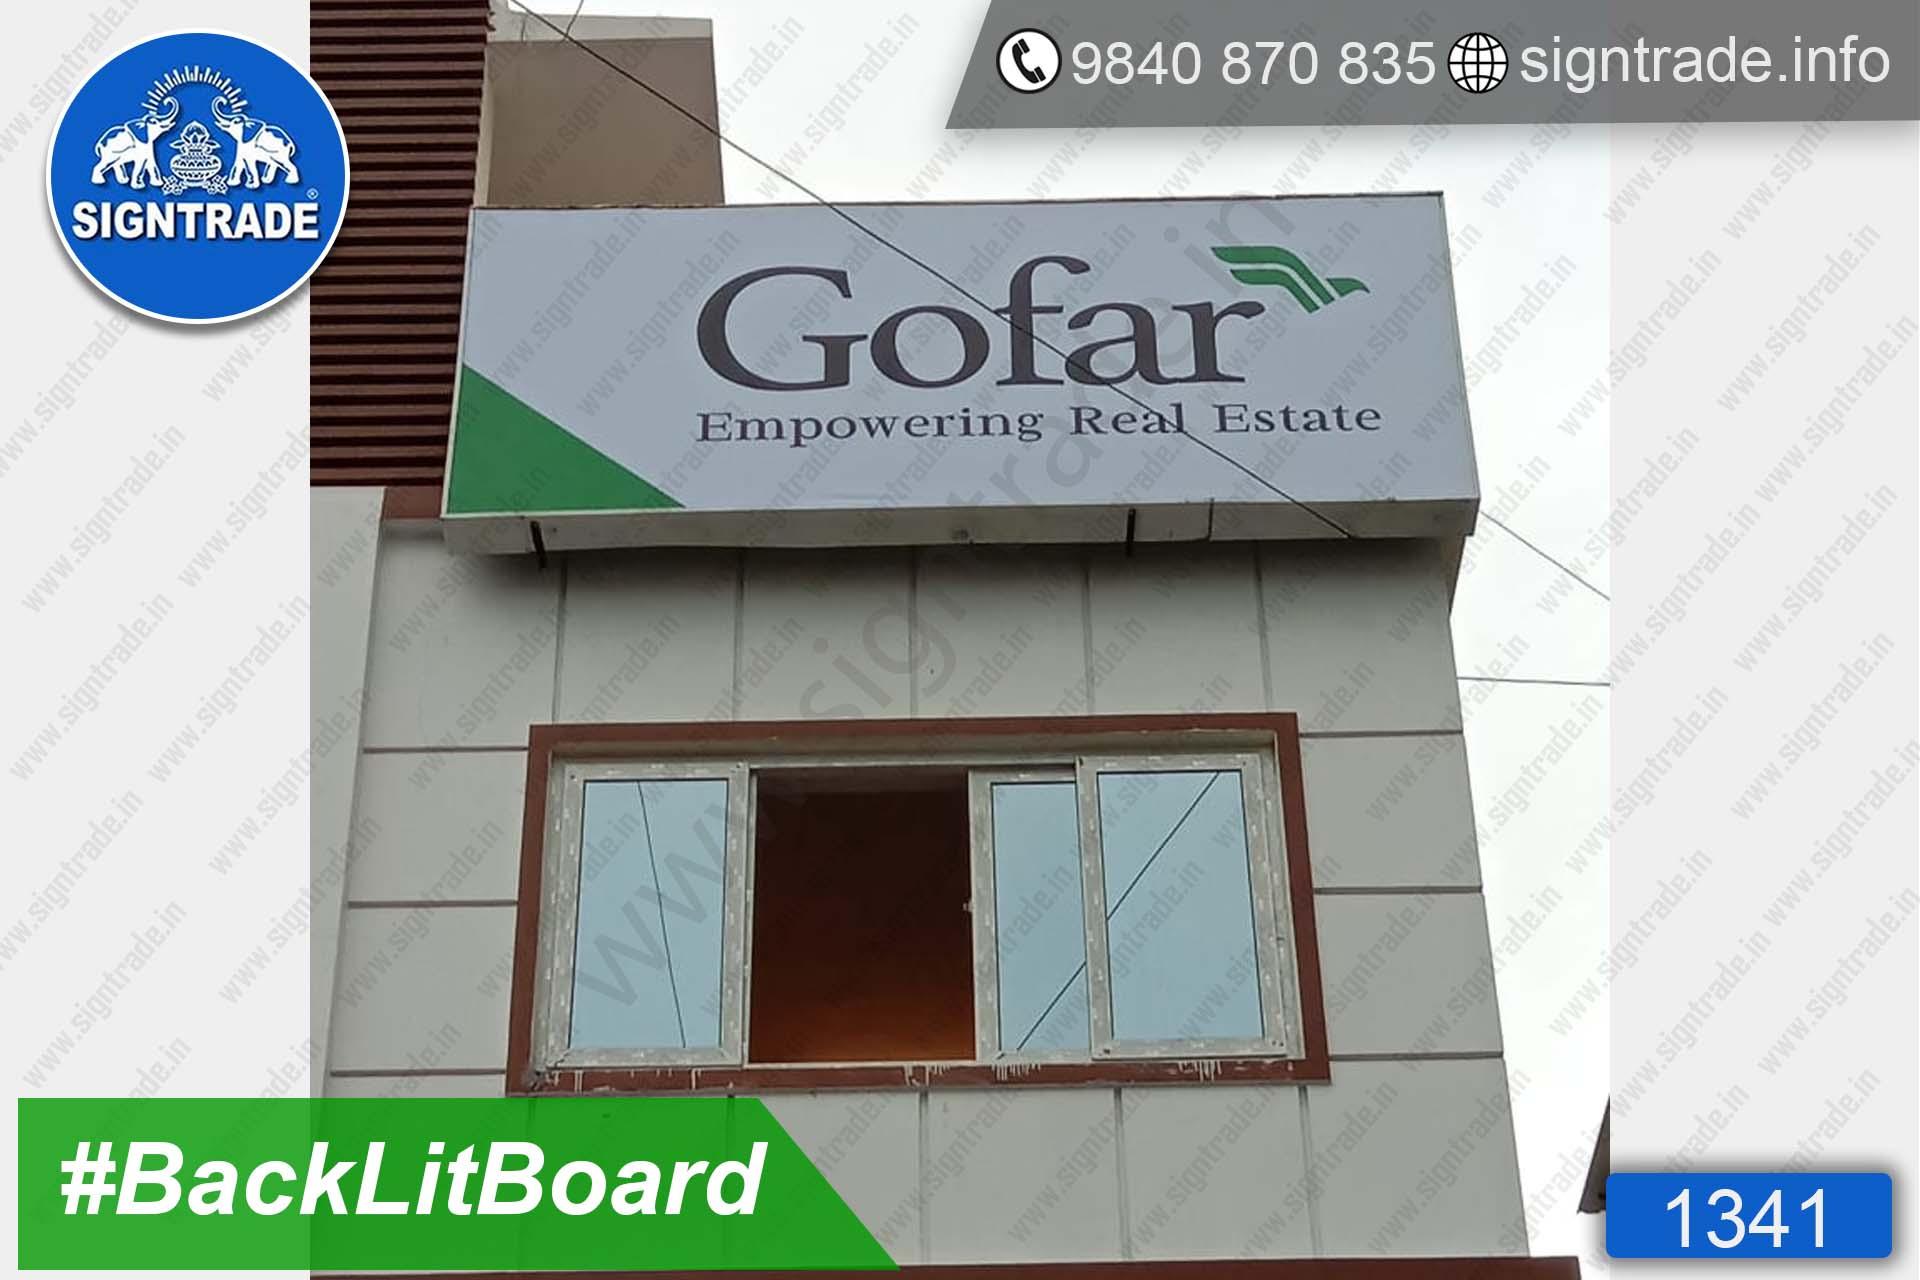 Gofar - Empowering Real Estate - Chennai - SIGNTRADE - BackLit Flex Board Manufacturers in Chennai